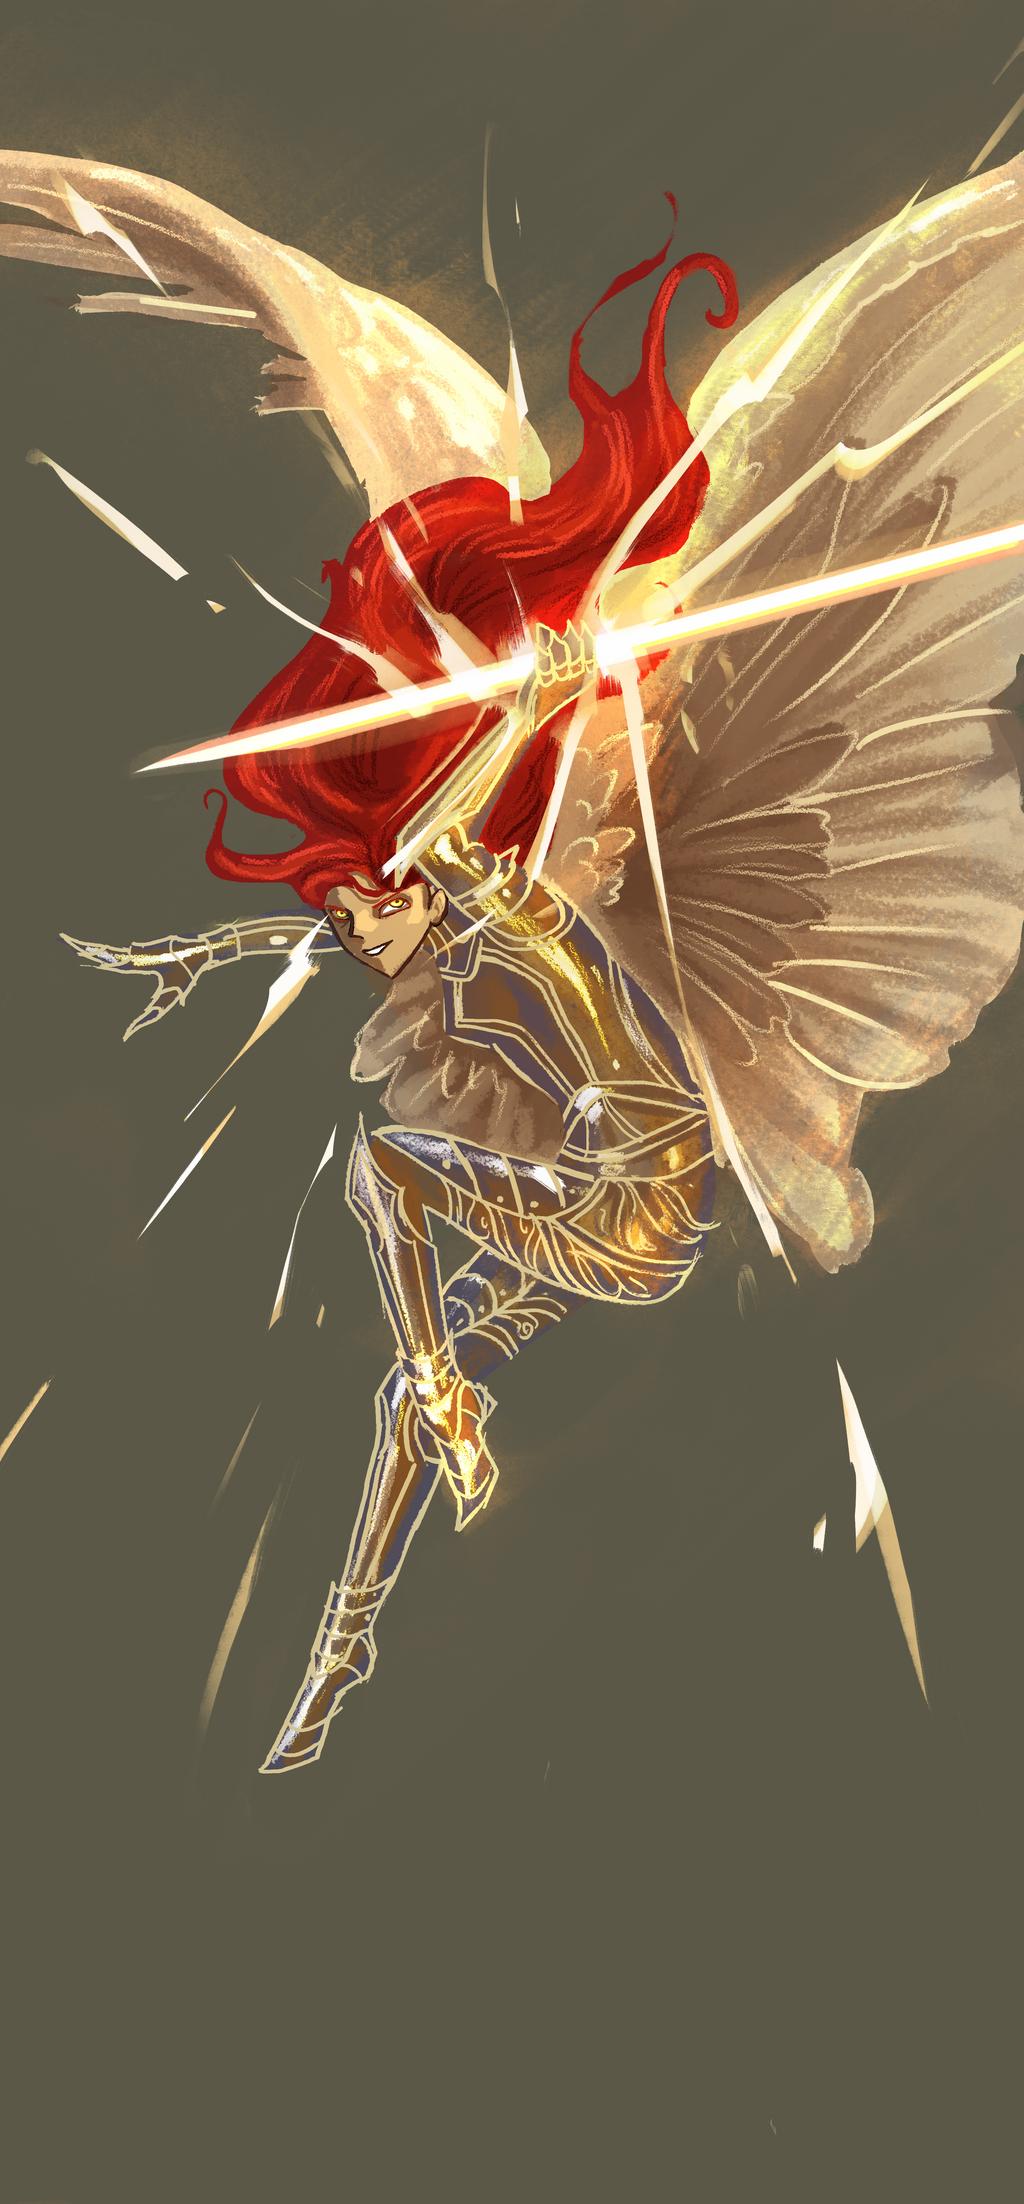 Battle Angel Character Design 2 by amidarosa